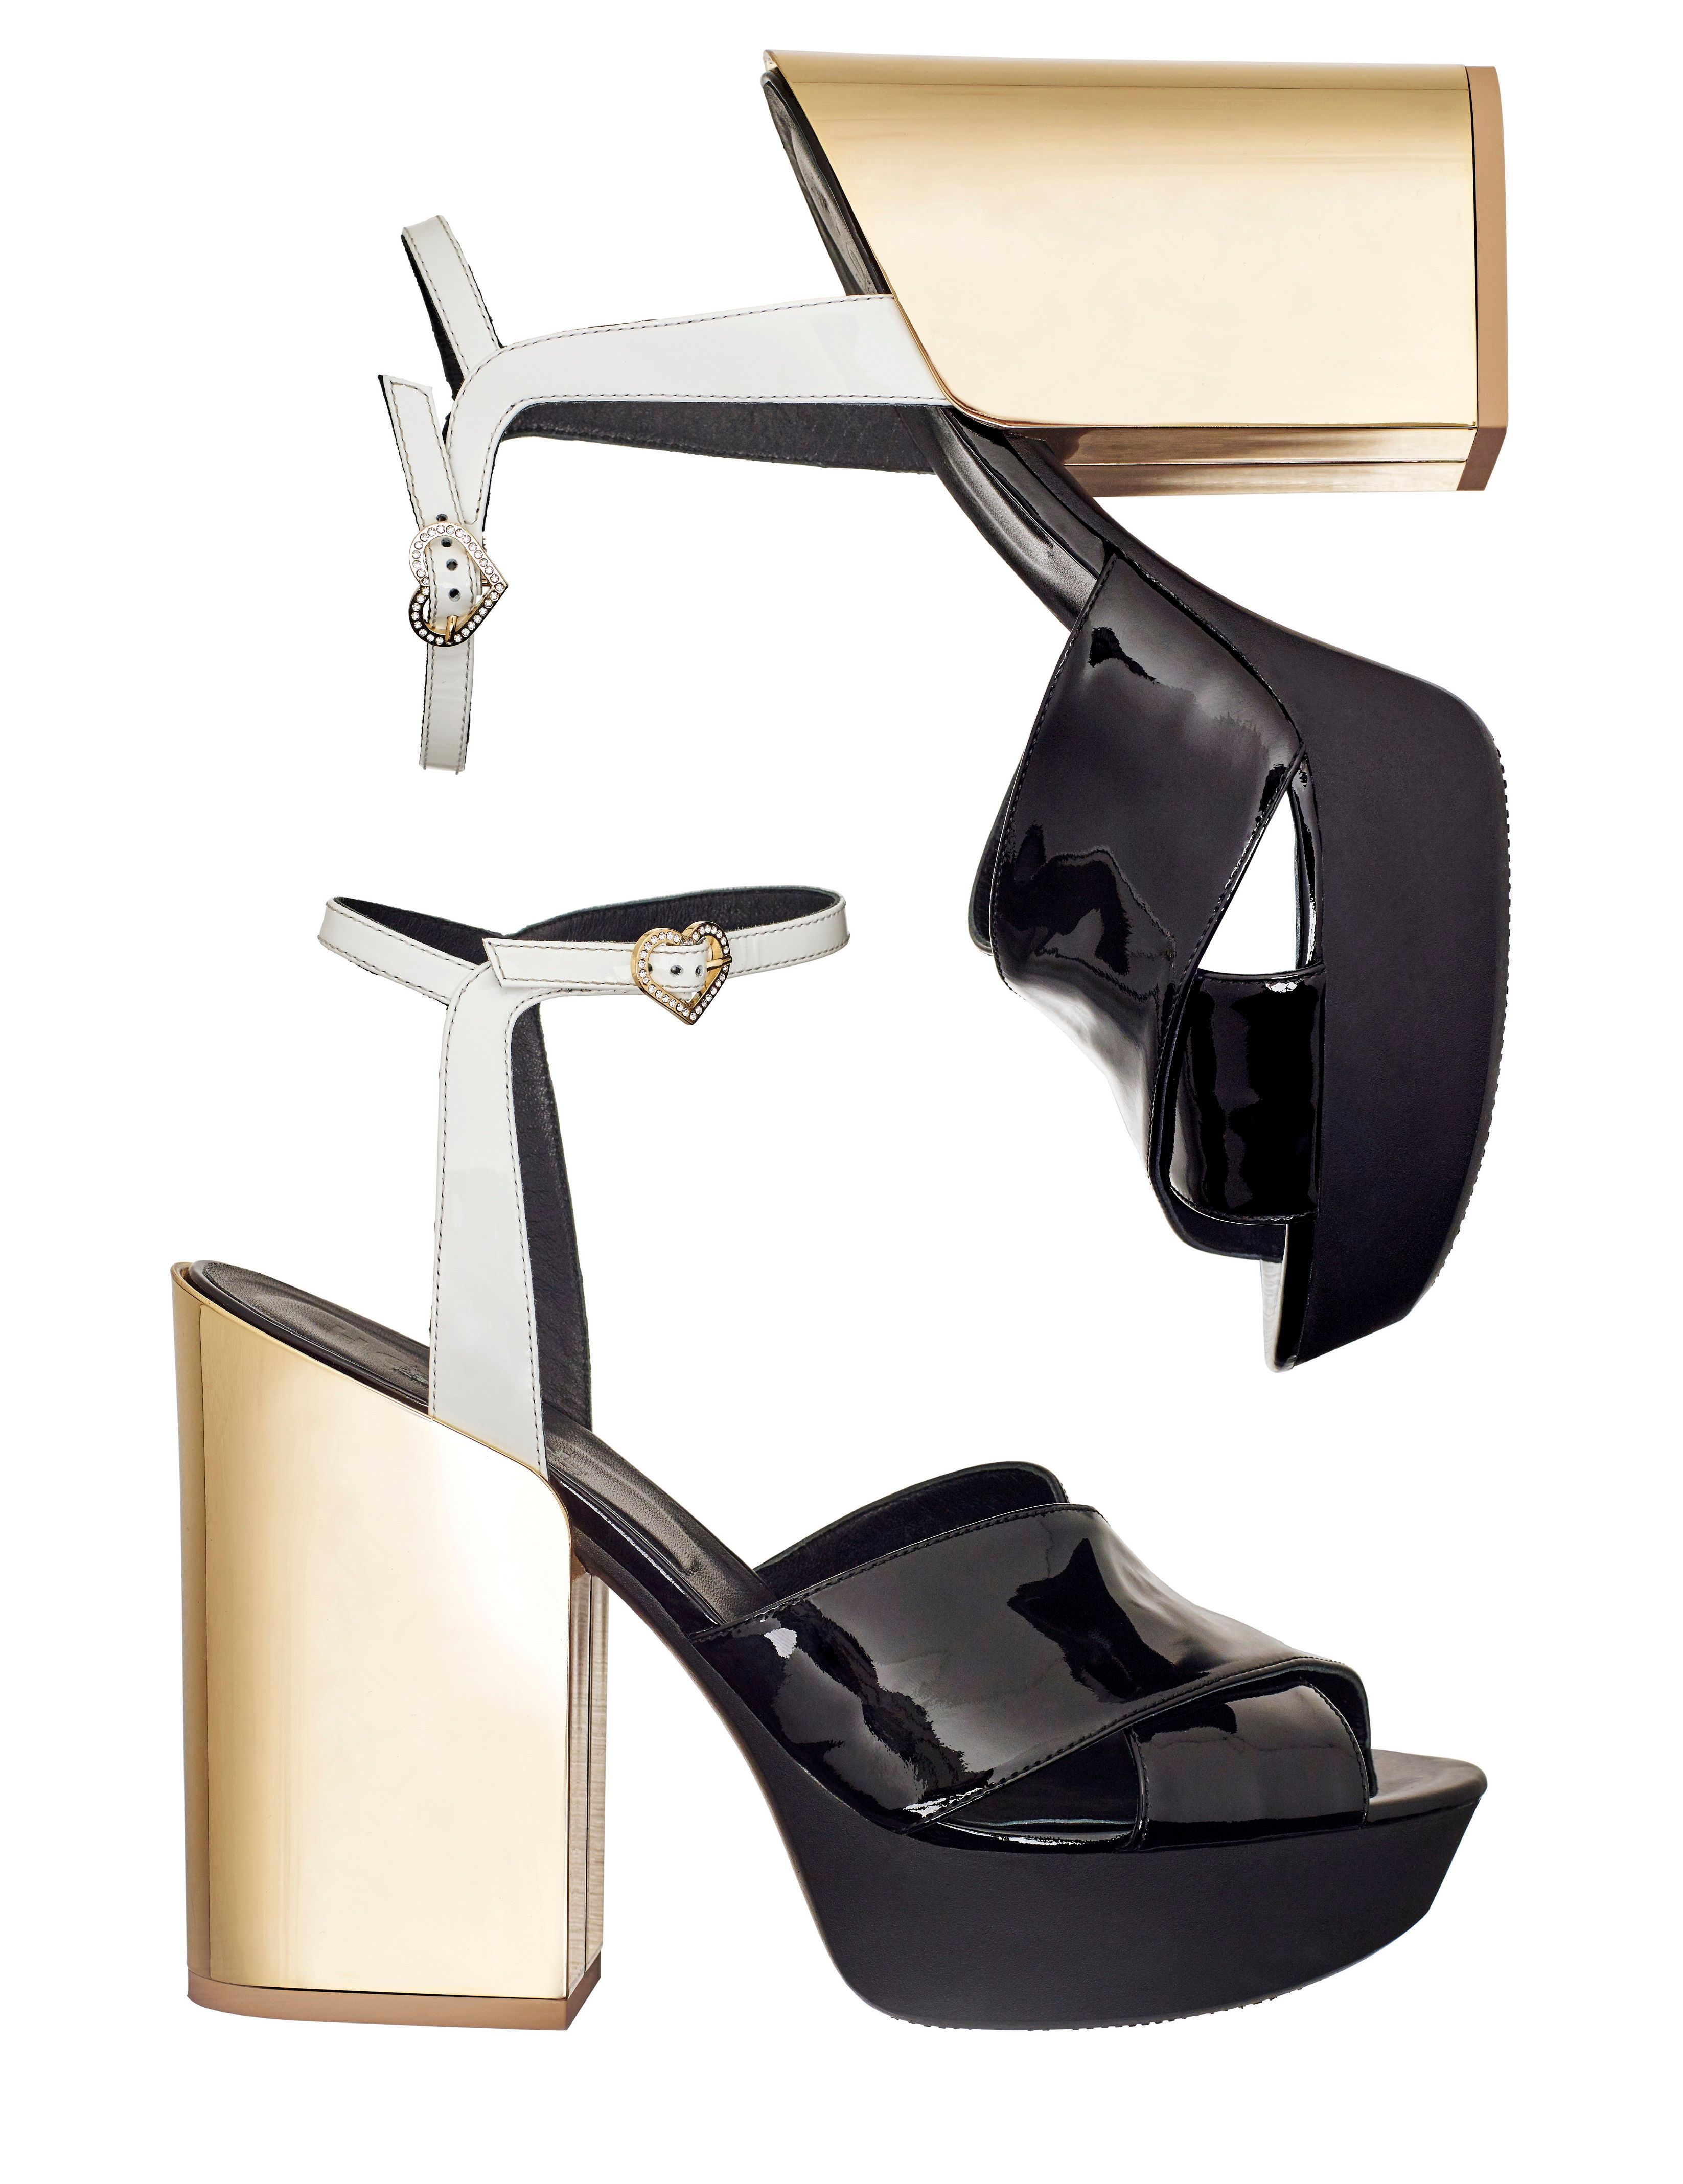 22_Hogan Platform sandals 335 Euros